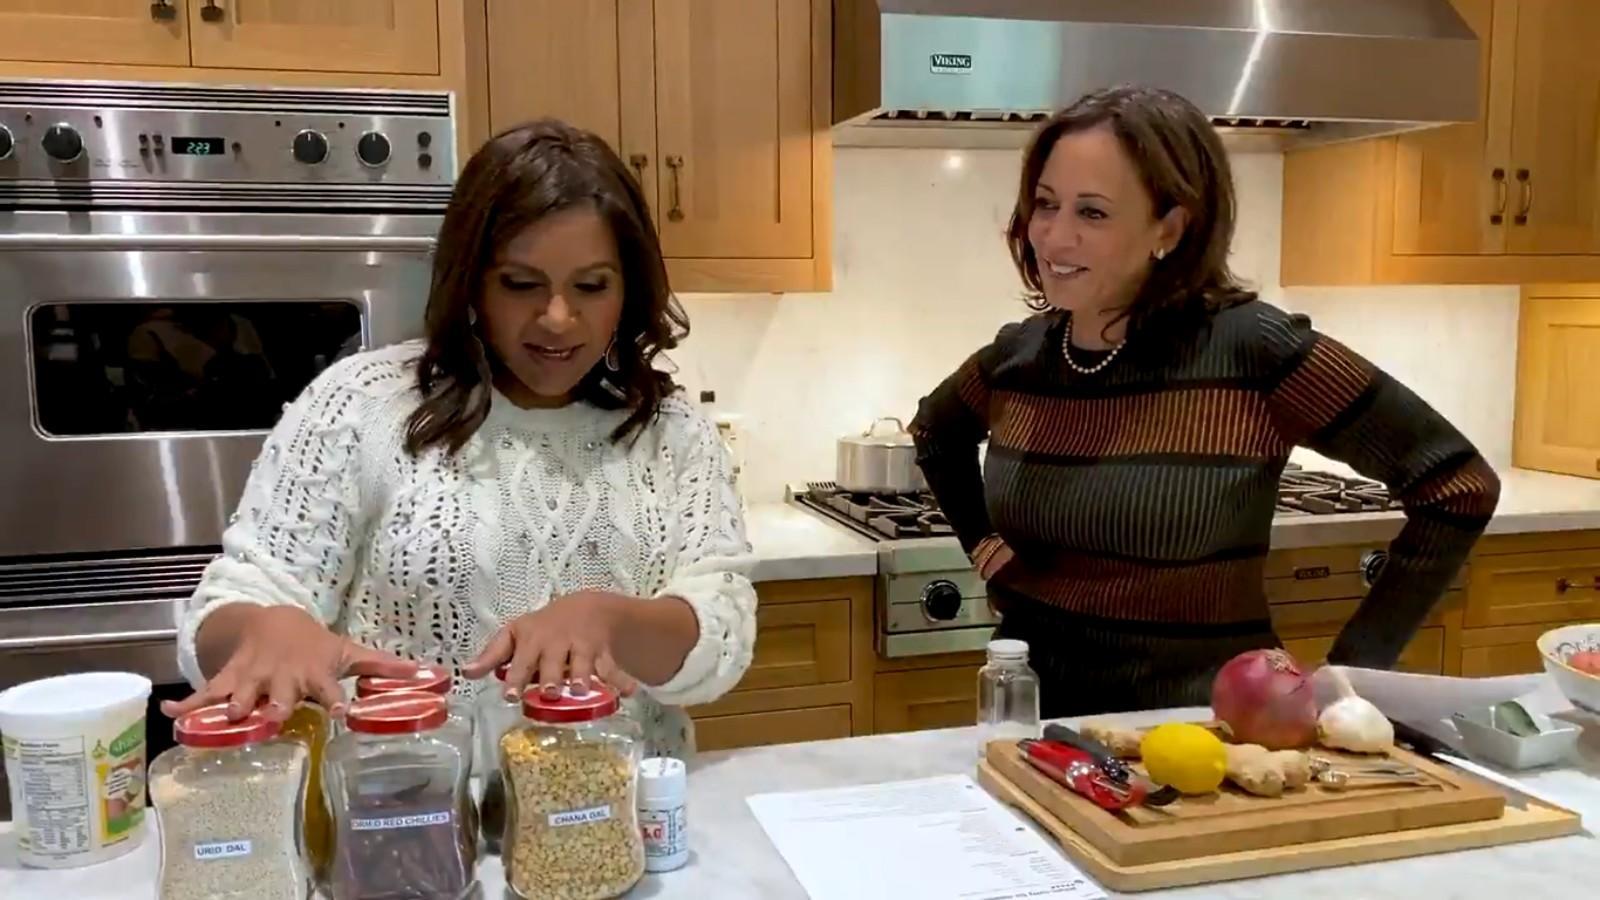 Dosa Duo Kamala Harris Mindy Kaling Cook Desi Style In Viral Video International Times Of India Videos